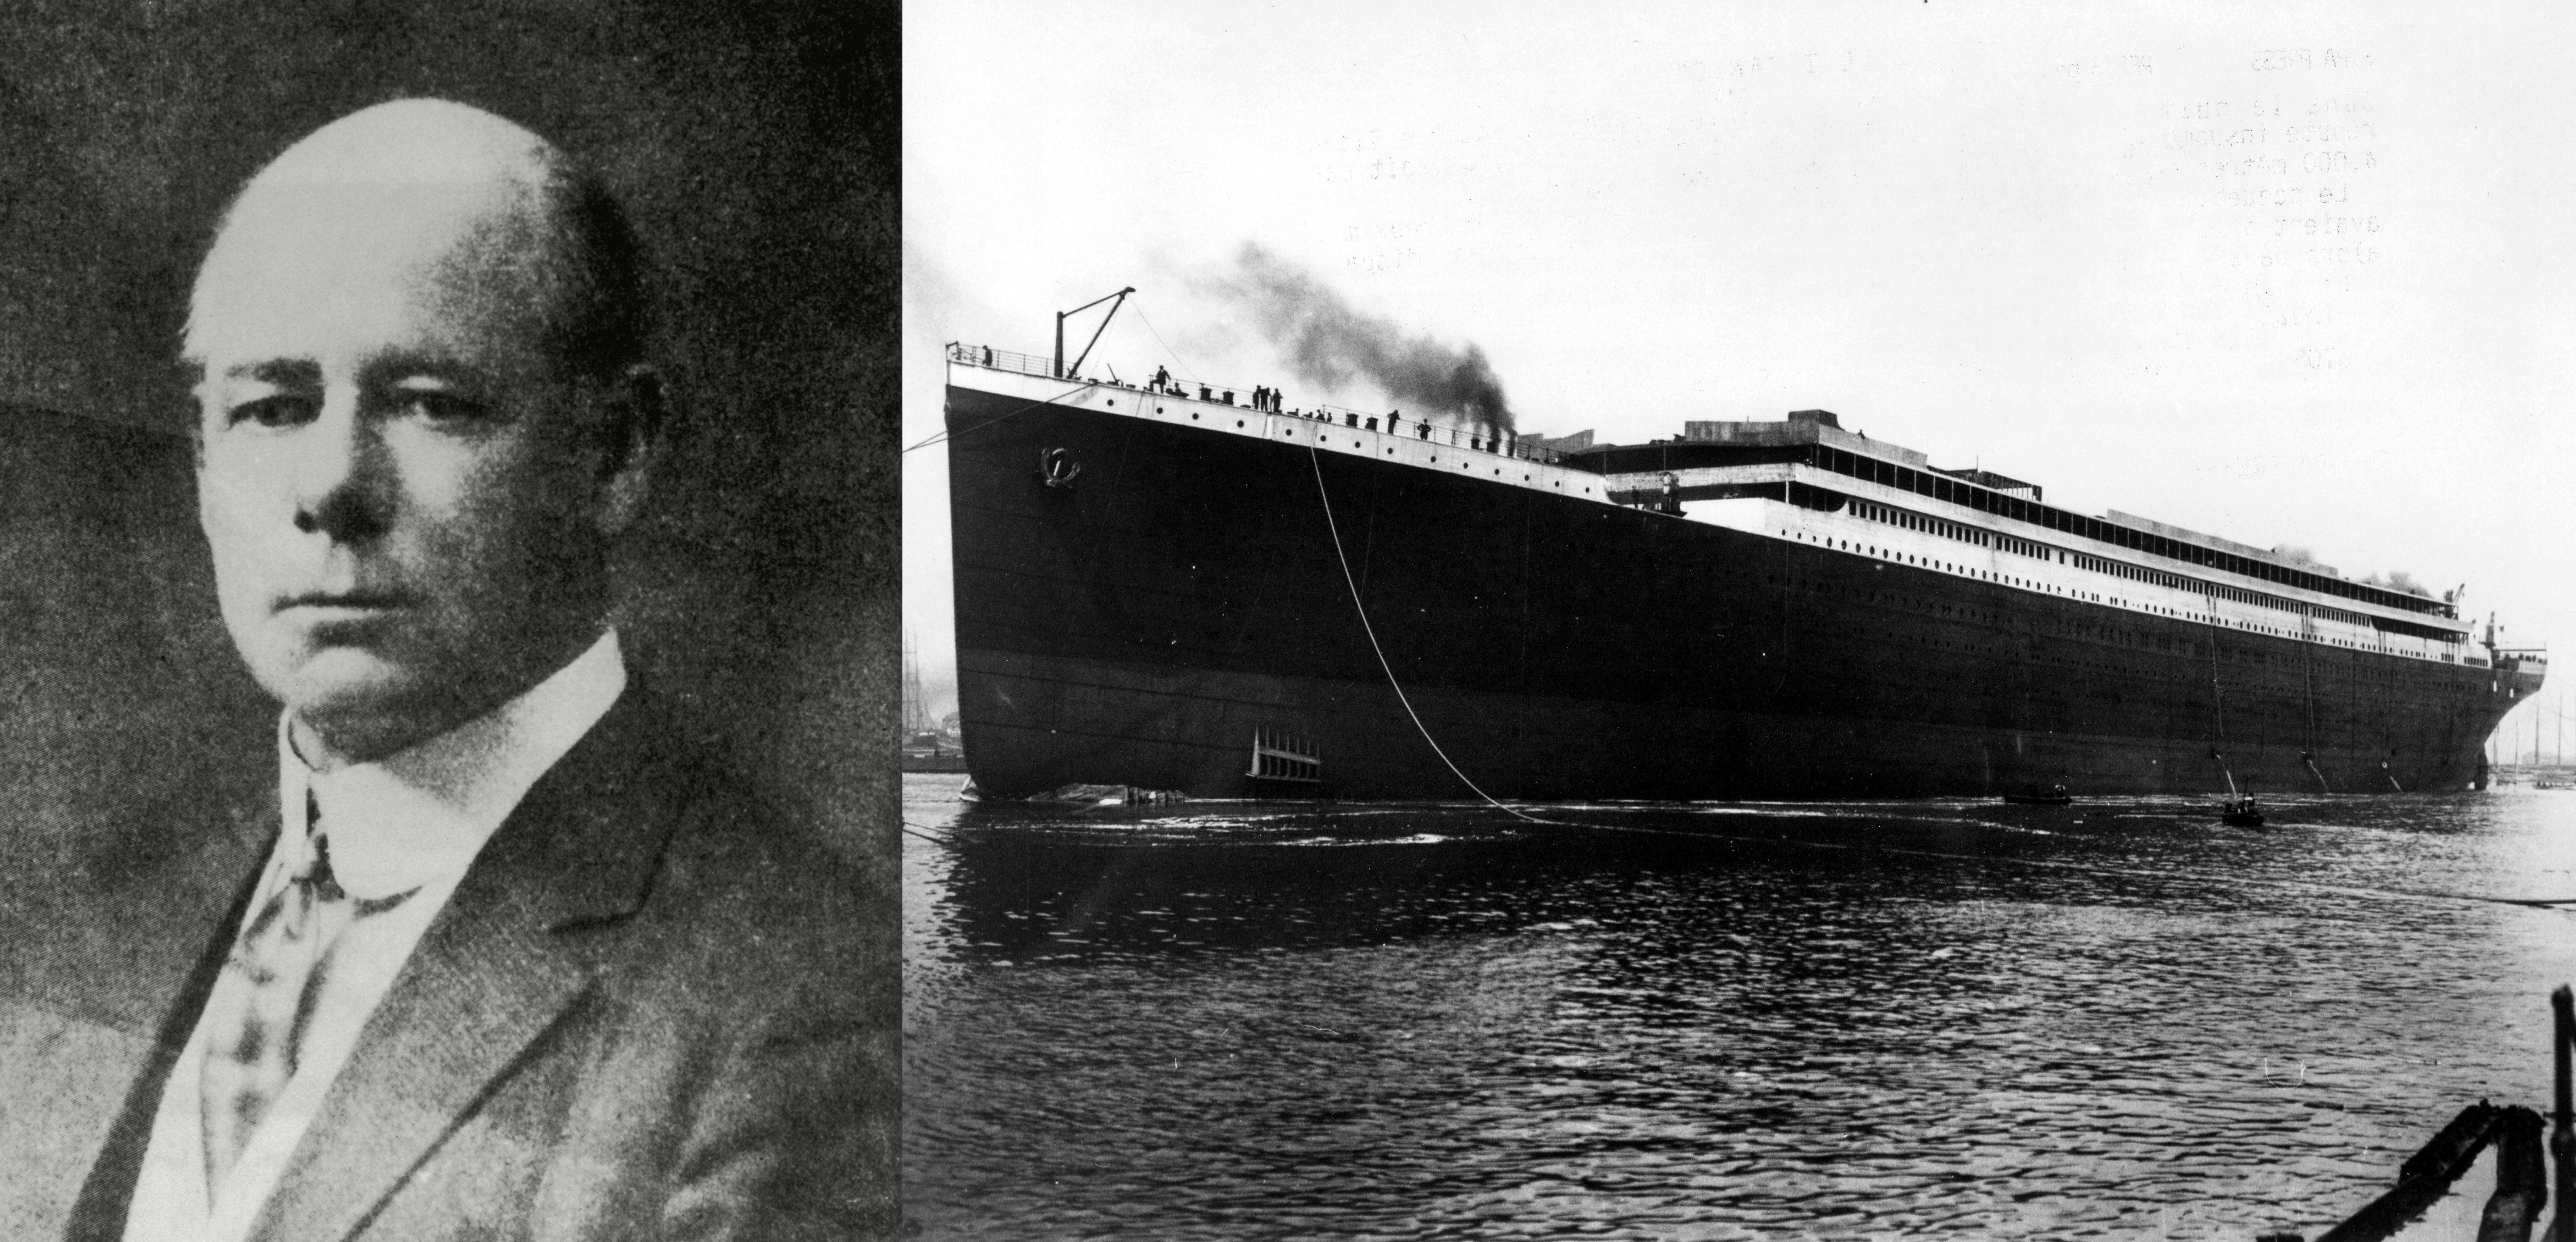 Mandatory Credit: Photo by Sipa/Shutterstock (118763c) Launching of the hull of the Titanic, Southampton, Britain - 31 May 1911 TITANIC SHIP RETROSPECTIVE